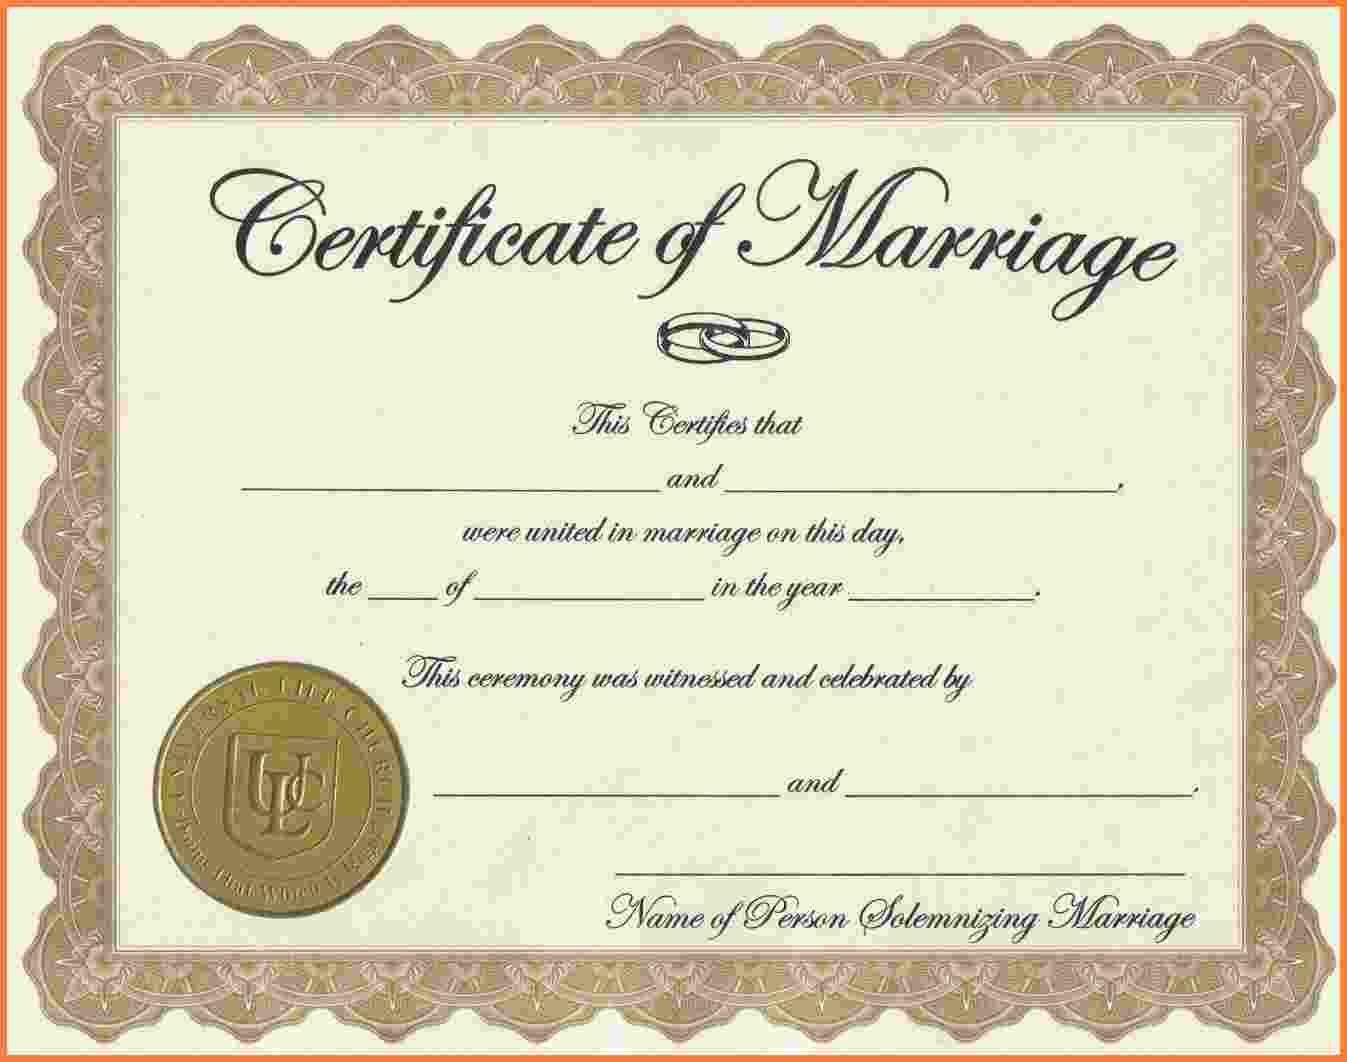 004 Blank Marriage Certificate License Printable Achievement - Fake Marriage Certificate Printable Free